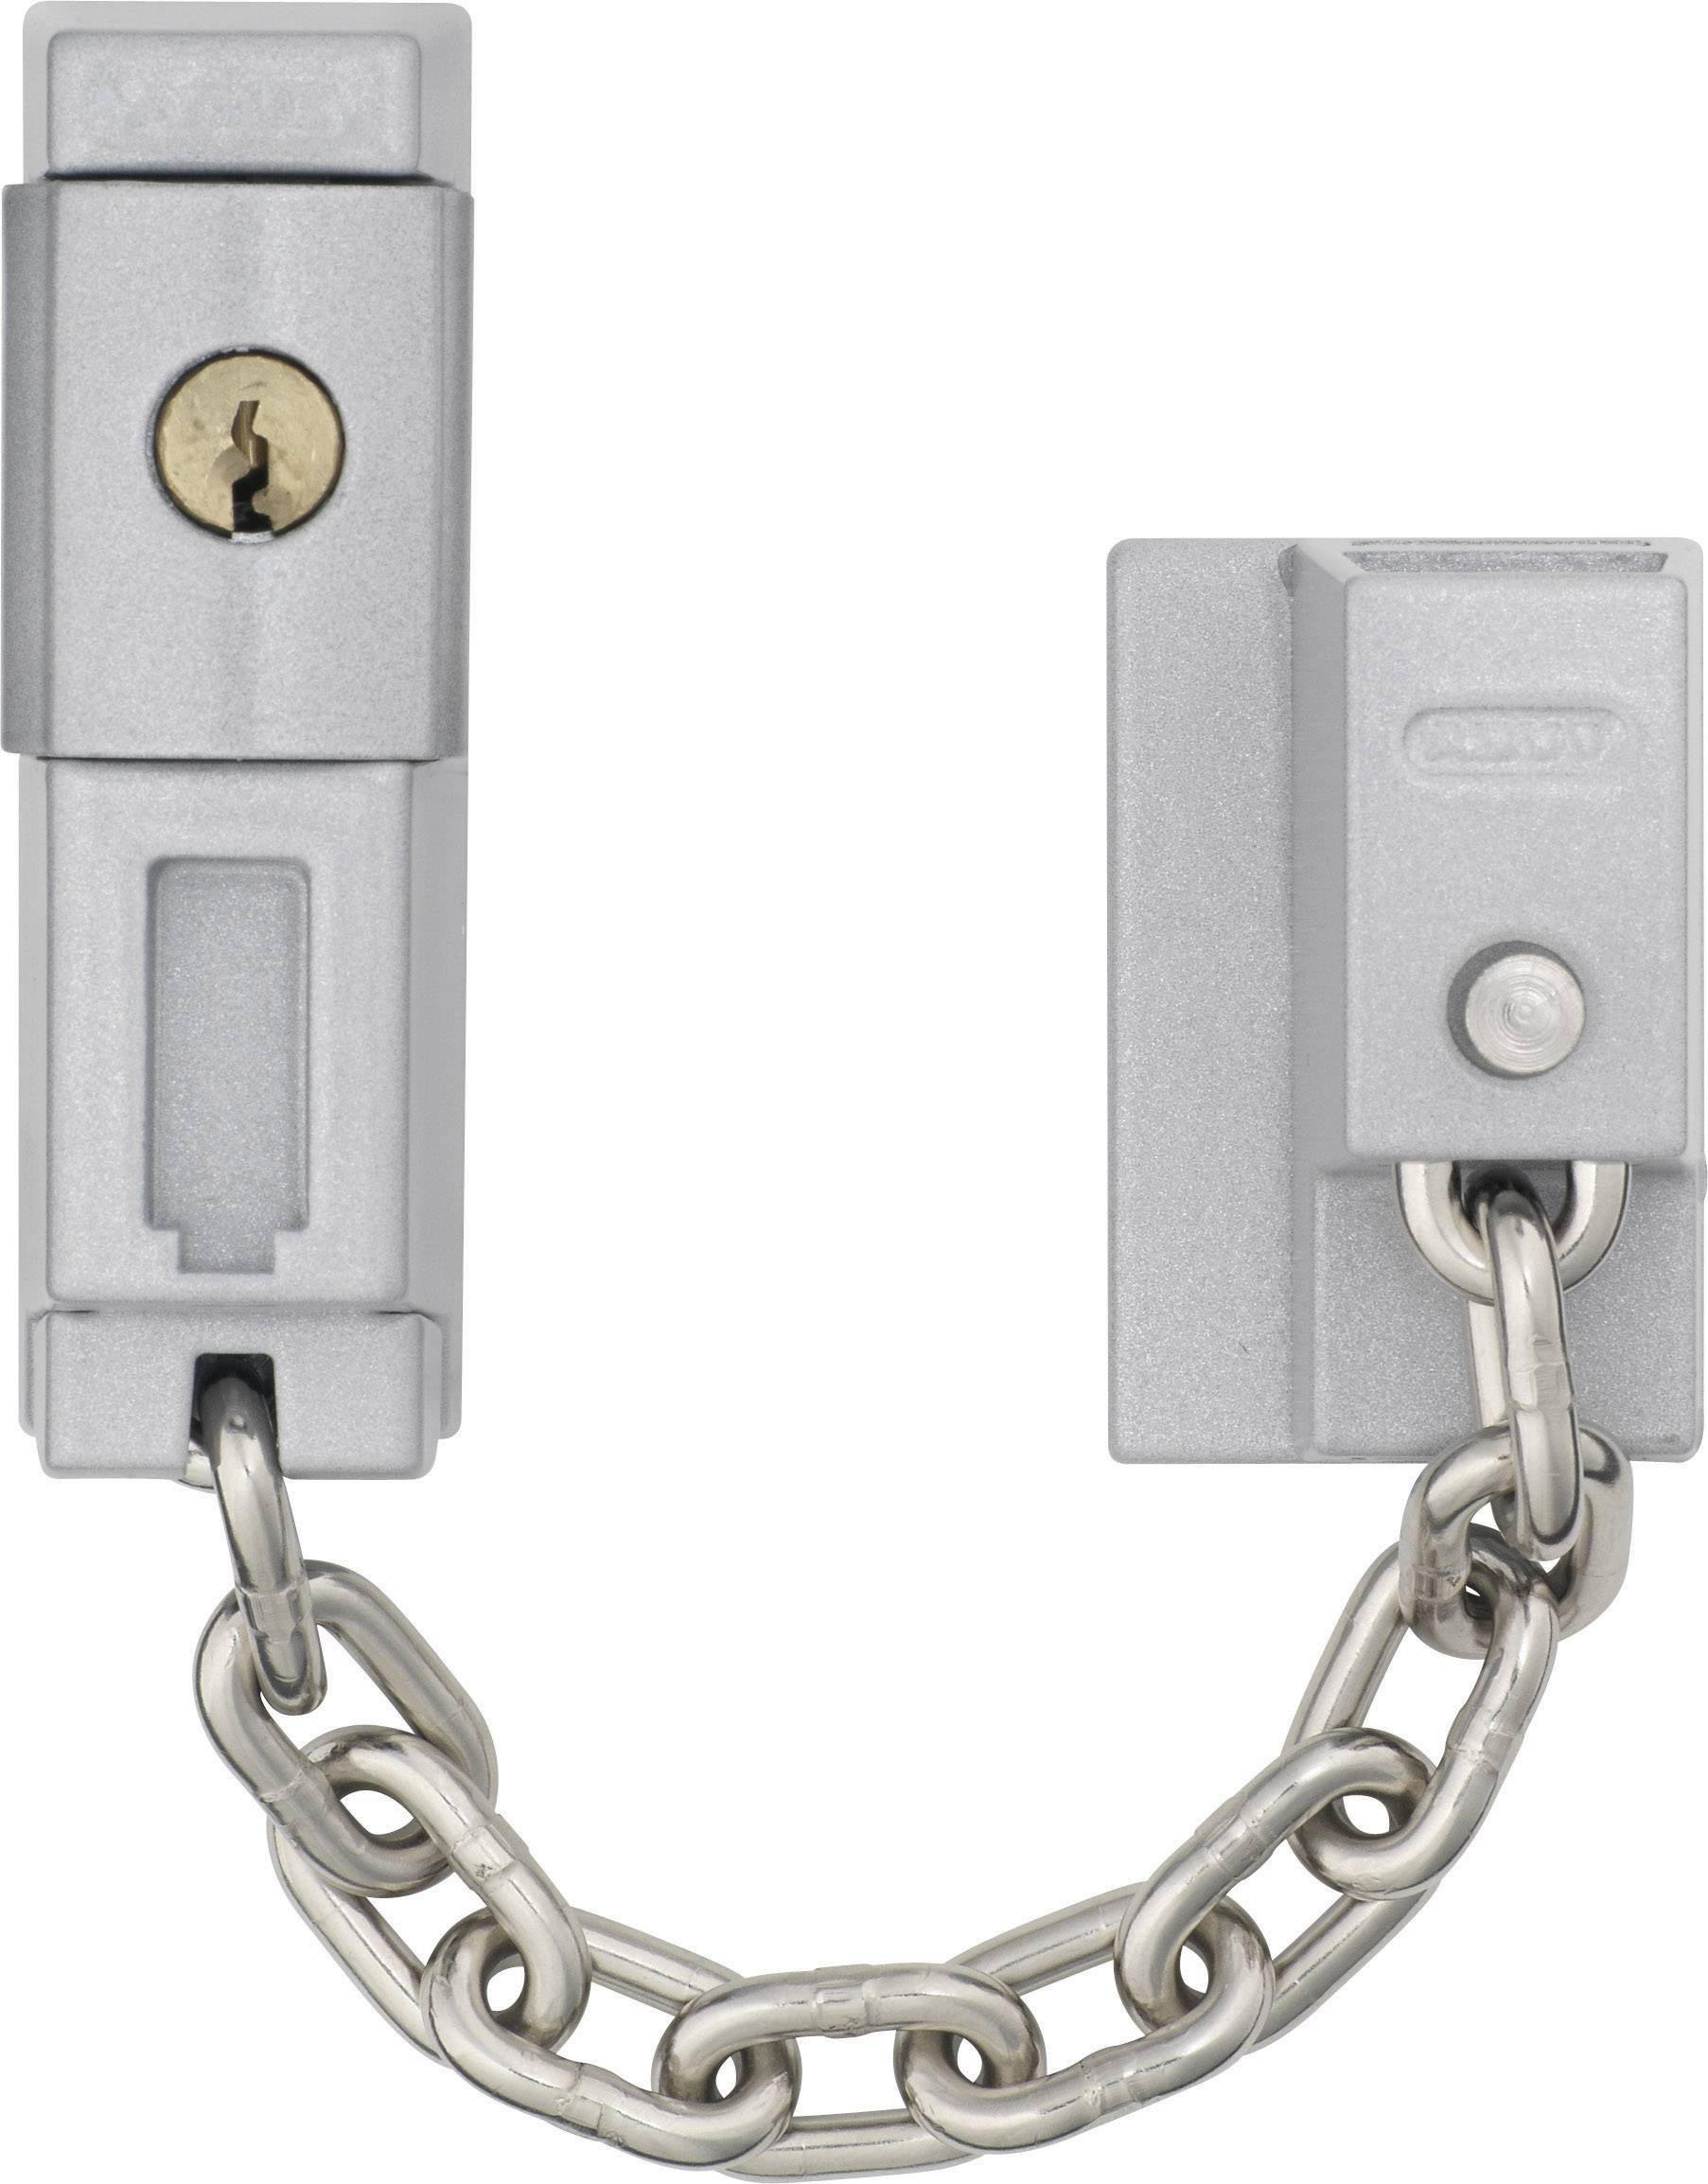 Bezpečnostná dverová reťaz na zámok ABUS SK79 S SB